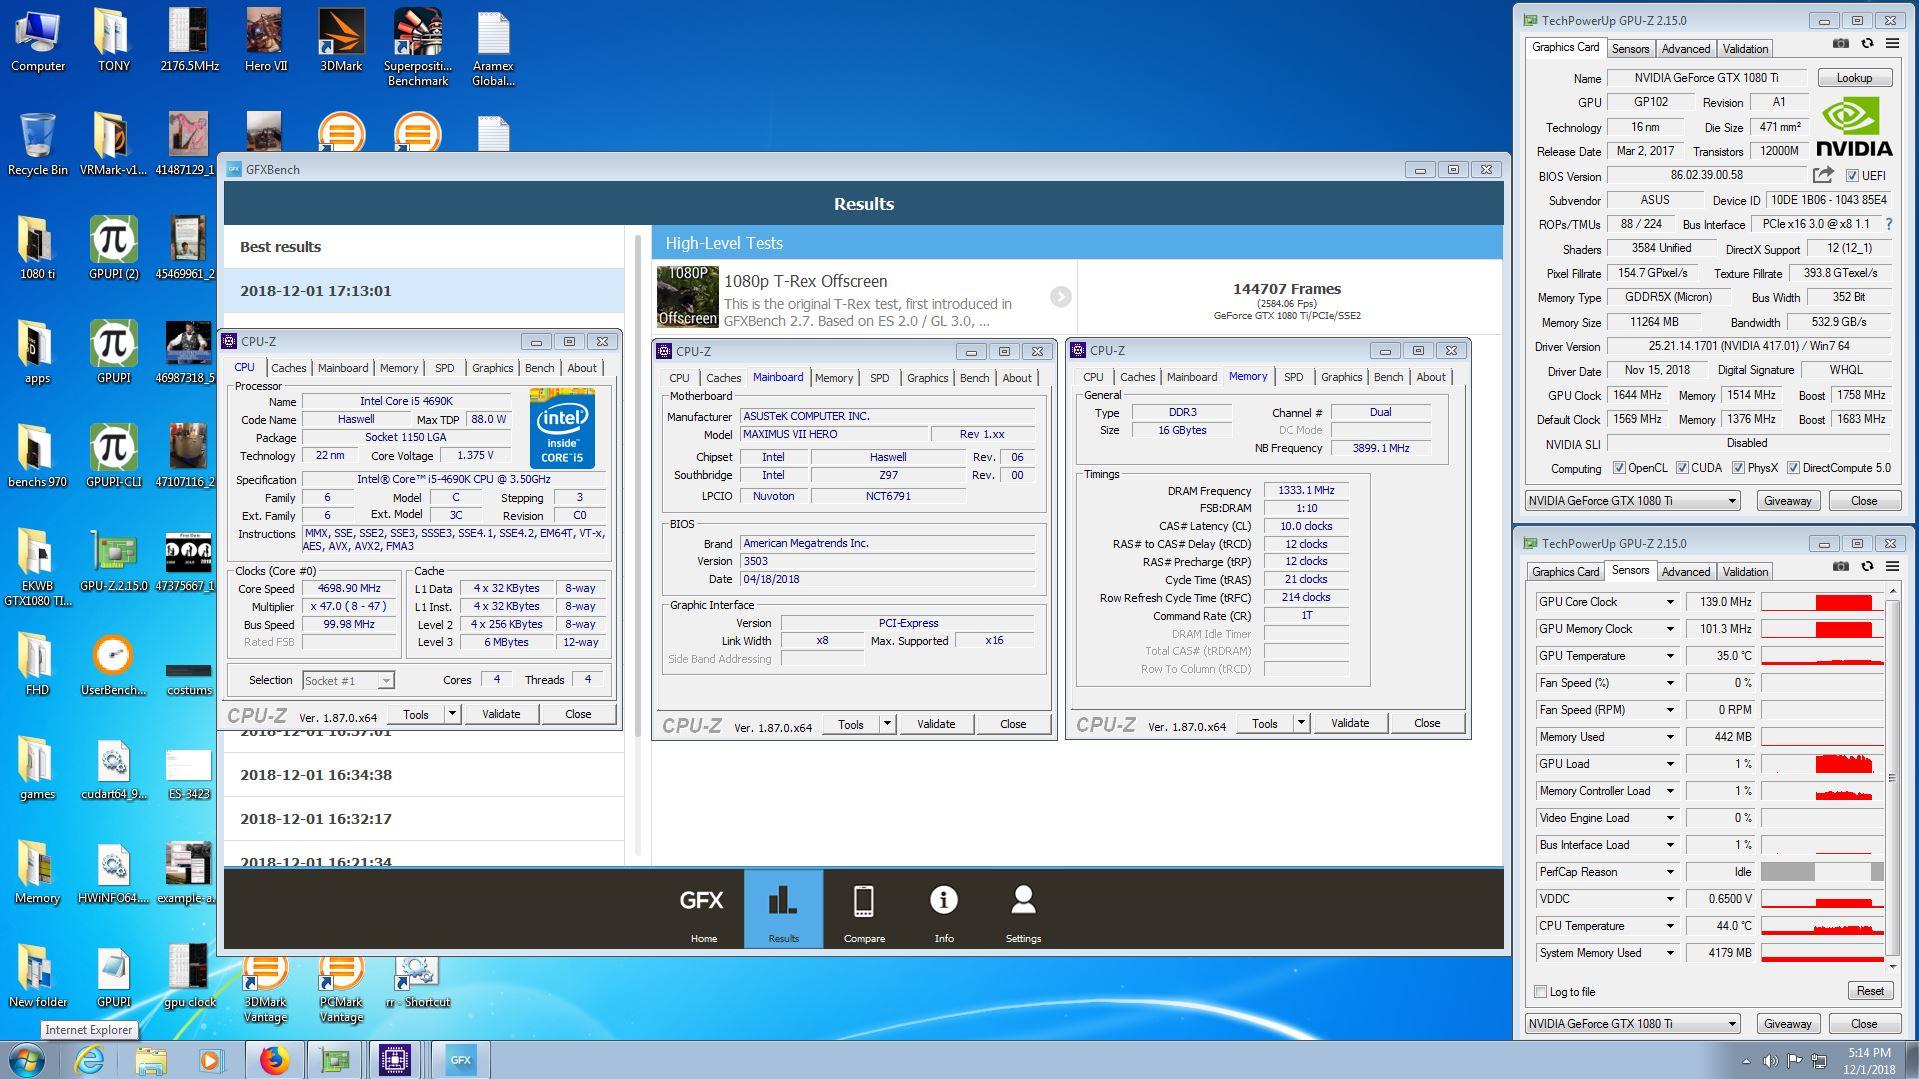 randyenergy`s GFXBench - 1080p T-Rex Offscreen score: 144707